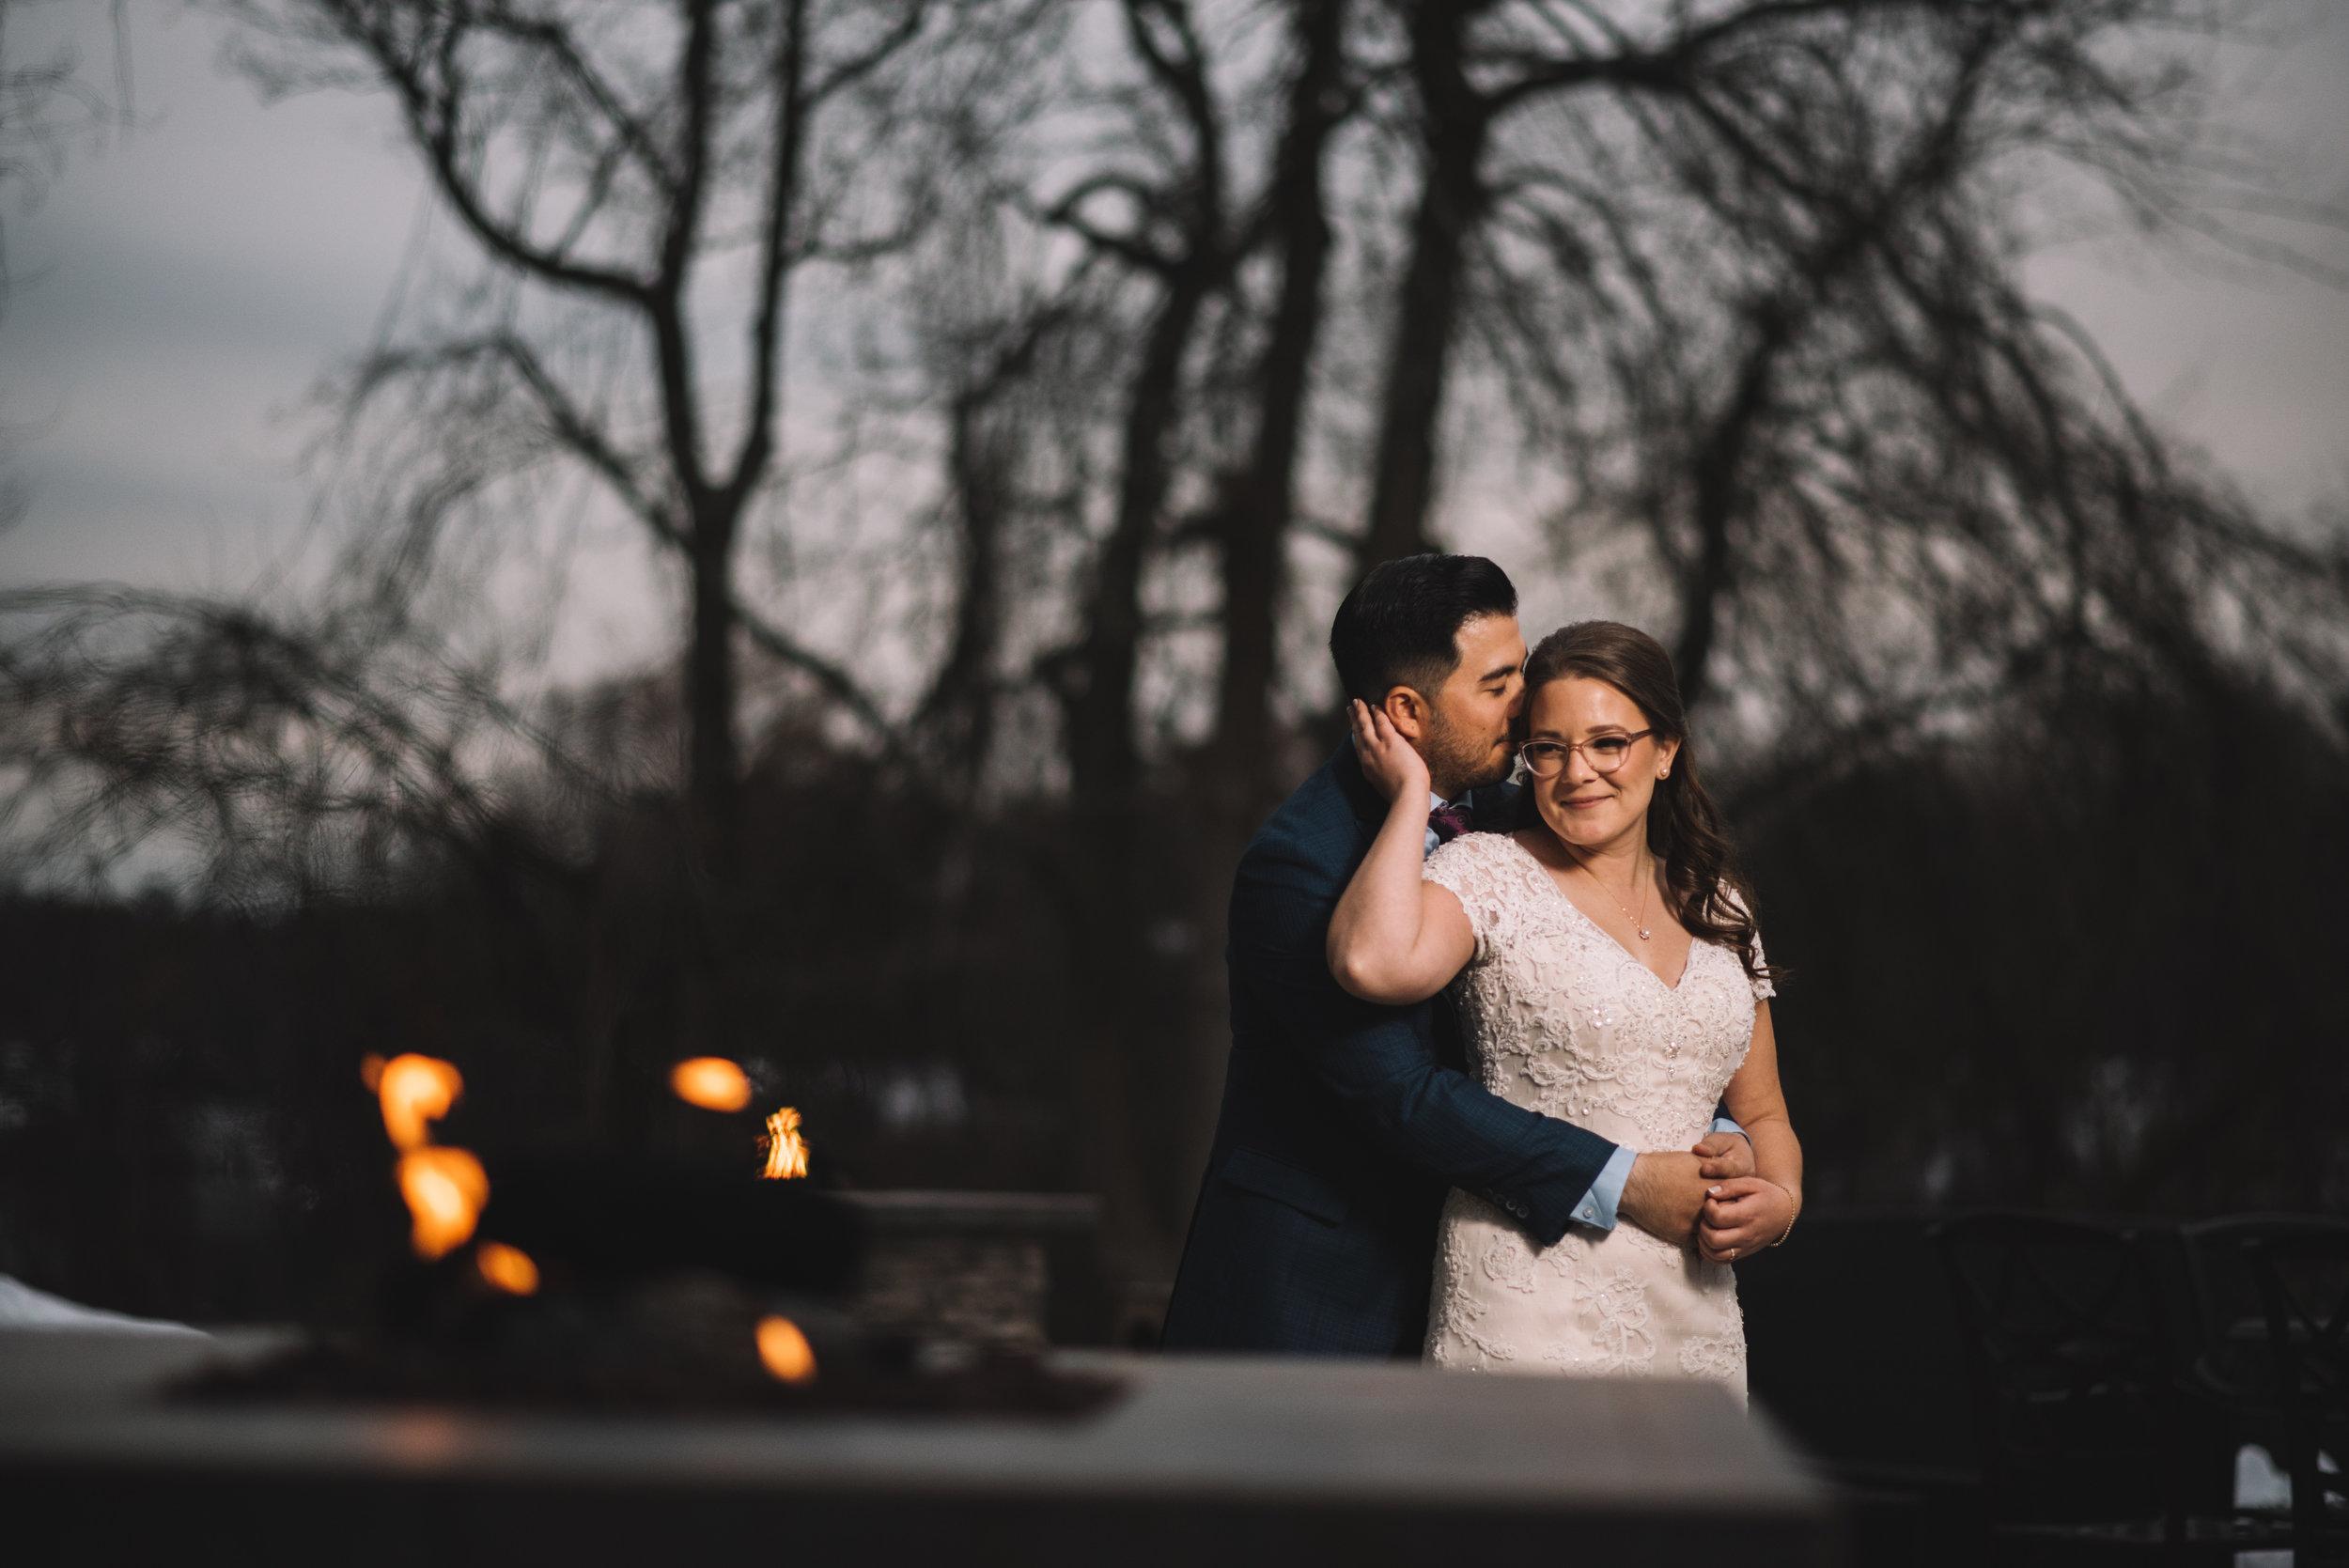 WeddingPhotos | NJPhotographer | Highlights-20.jpg